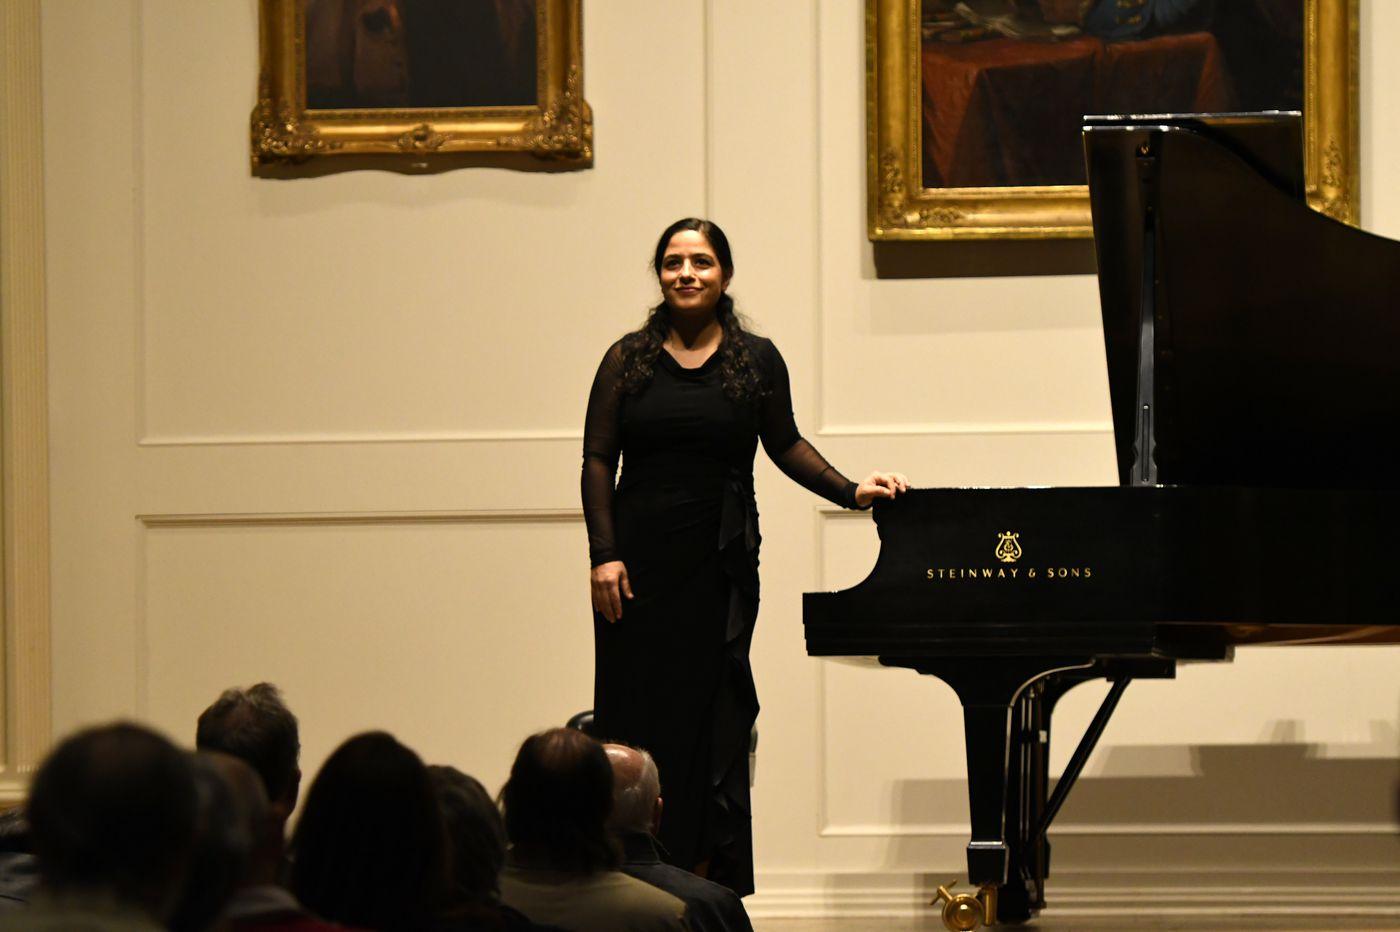 In Philadelphia debut, pianist Einav Yarden is an intriguing personality